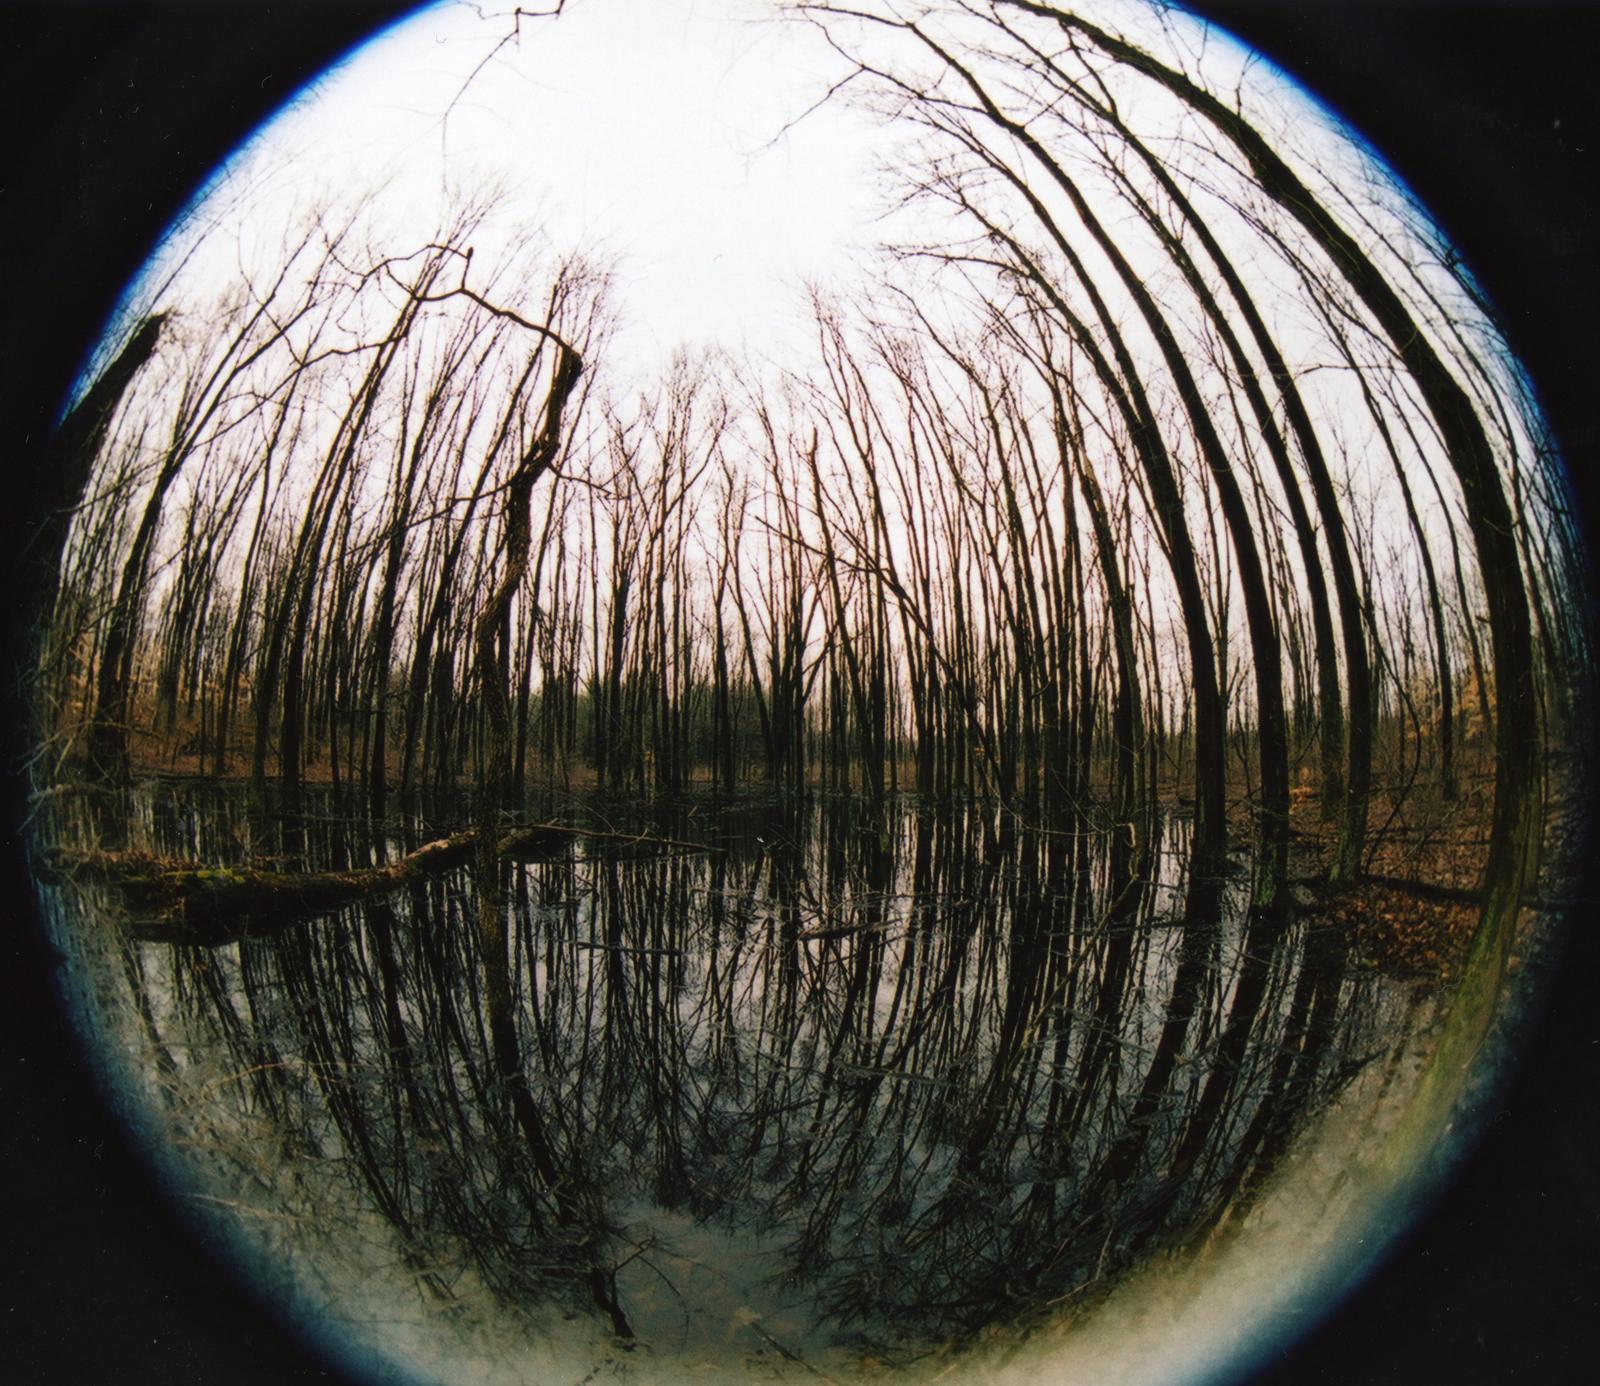 Fisheye Camera Lens View